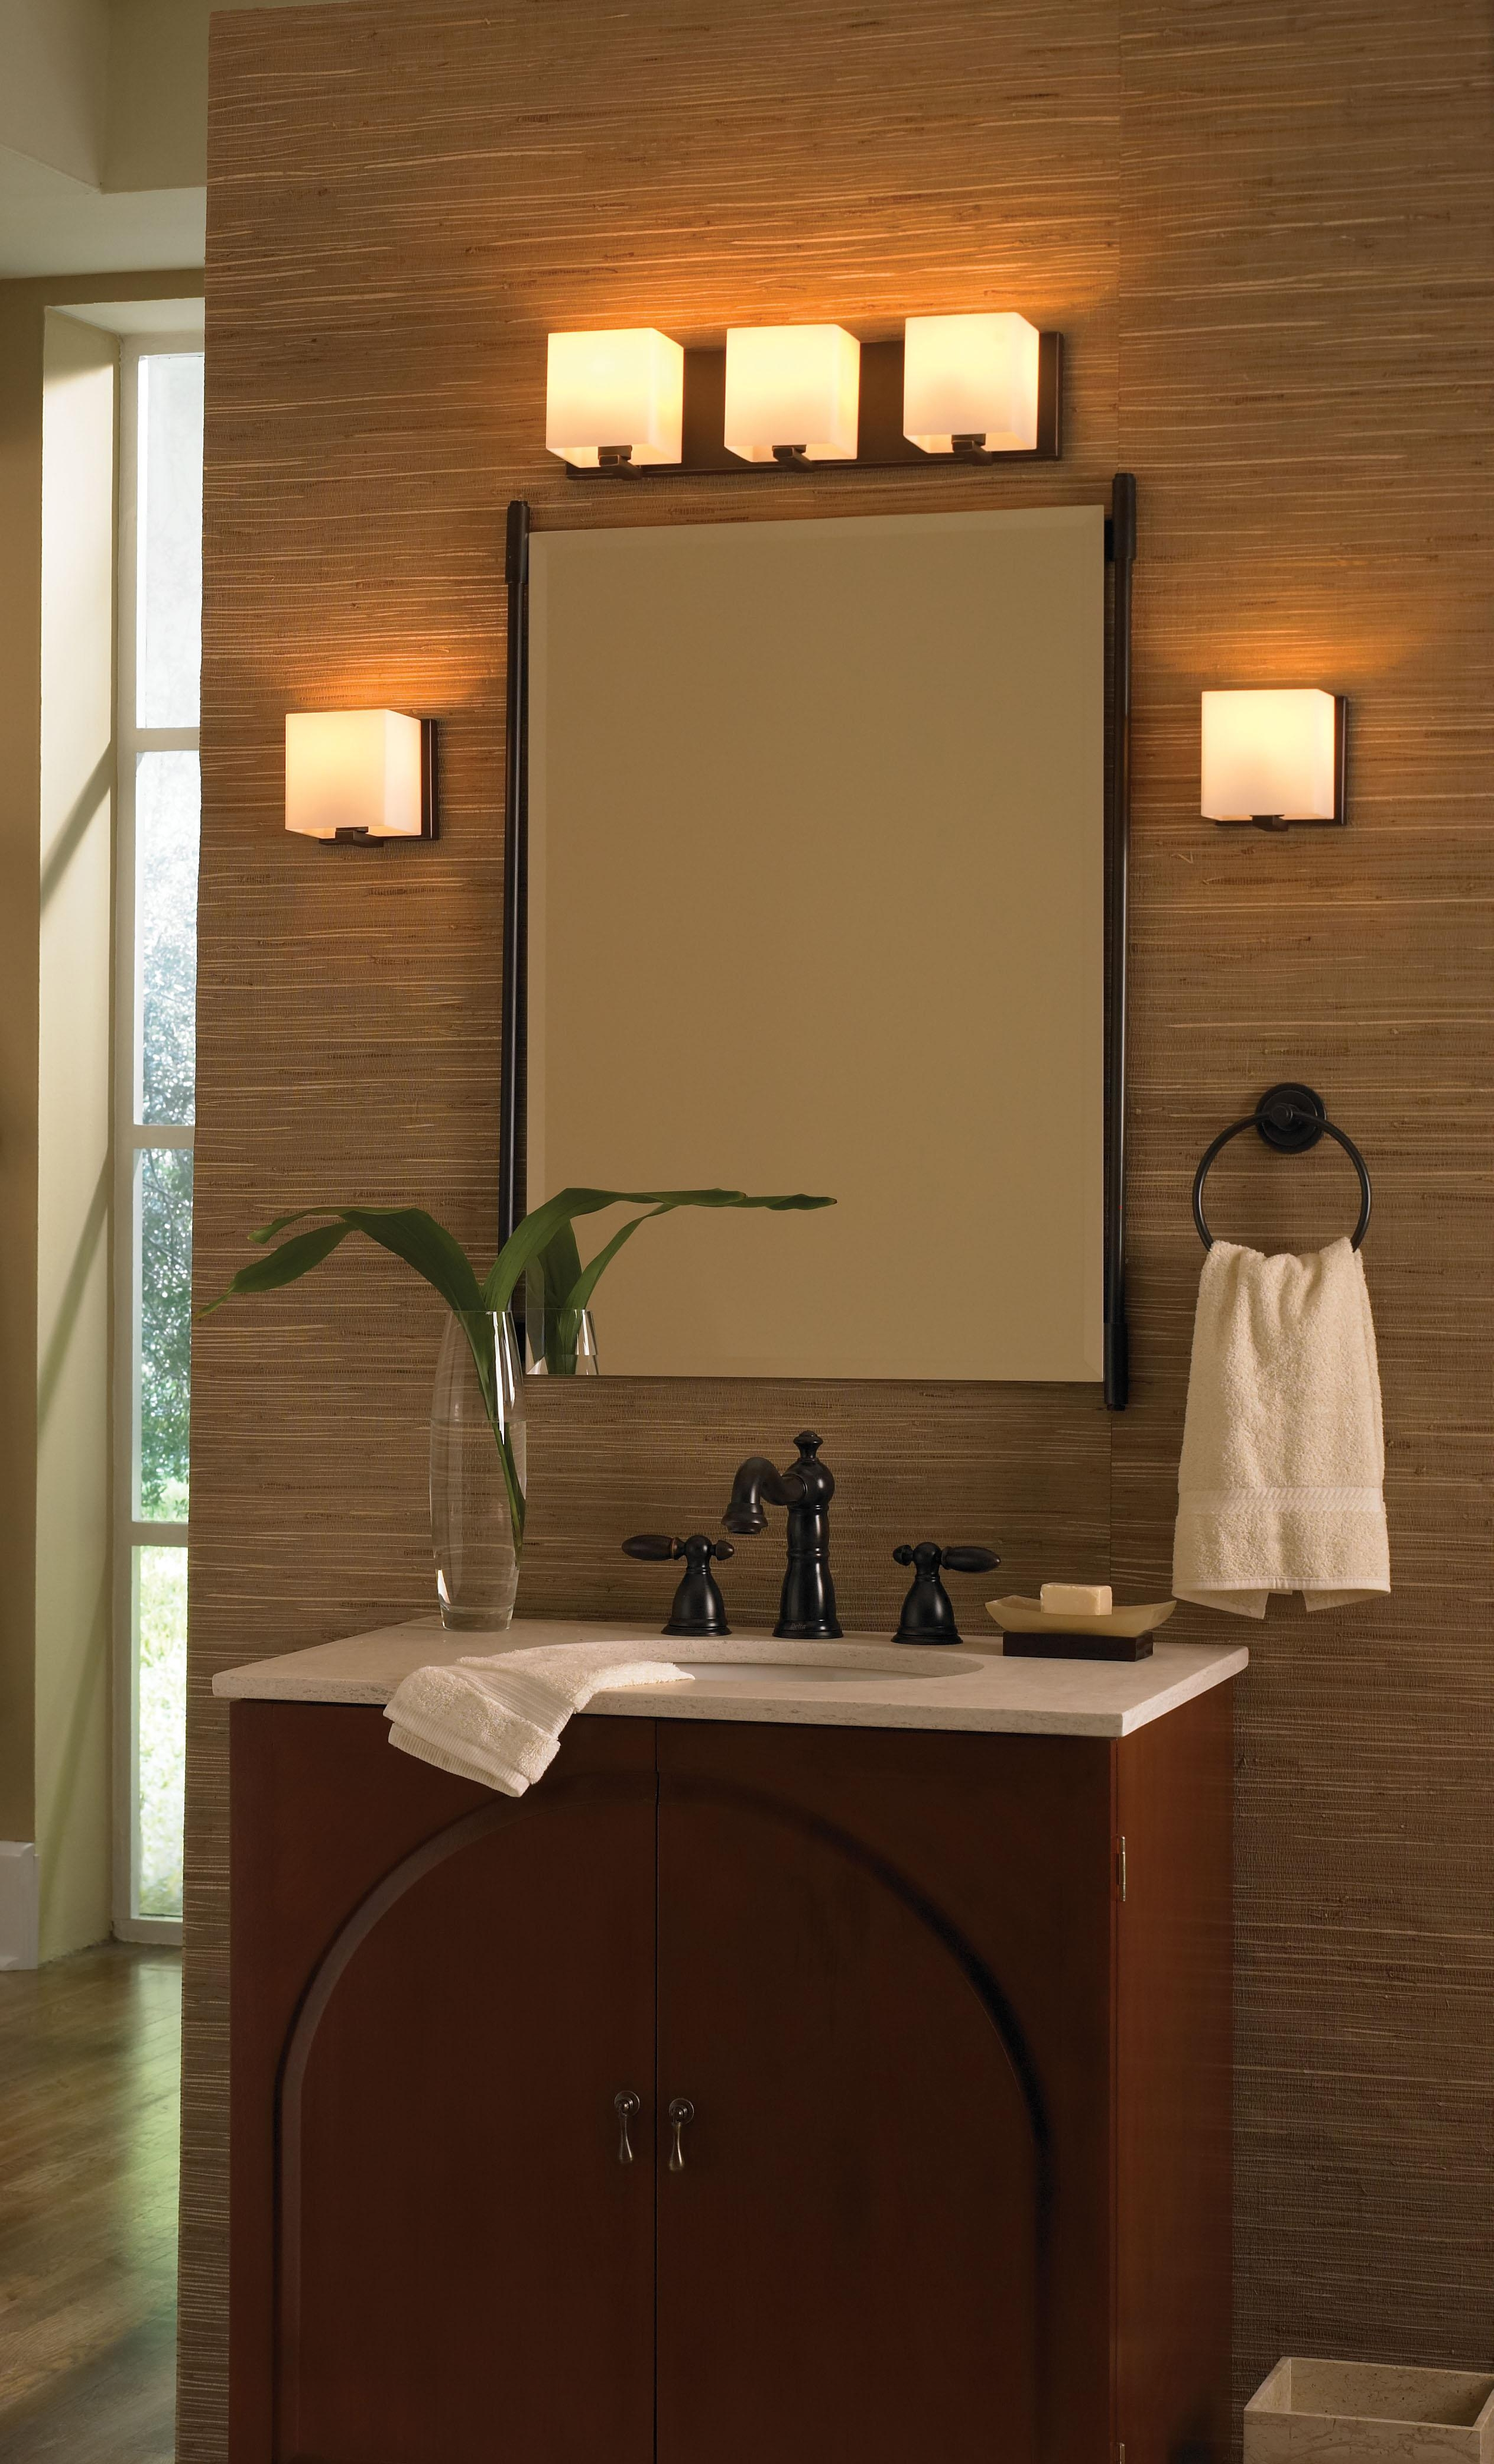 Modern Bathroom Lighting Bathroom Spotlights Bathroom Mirror Regarding Lights For Bathroom Mirrors (Image 16 of 20)